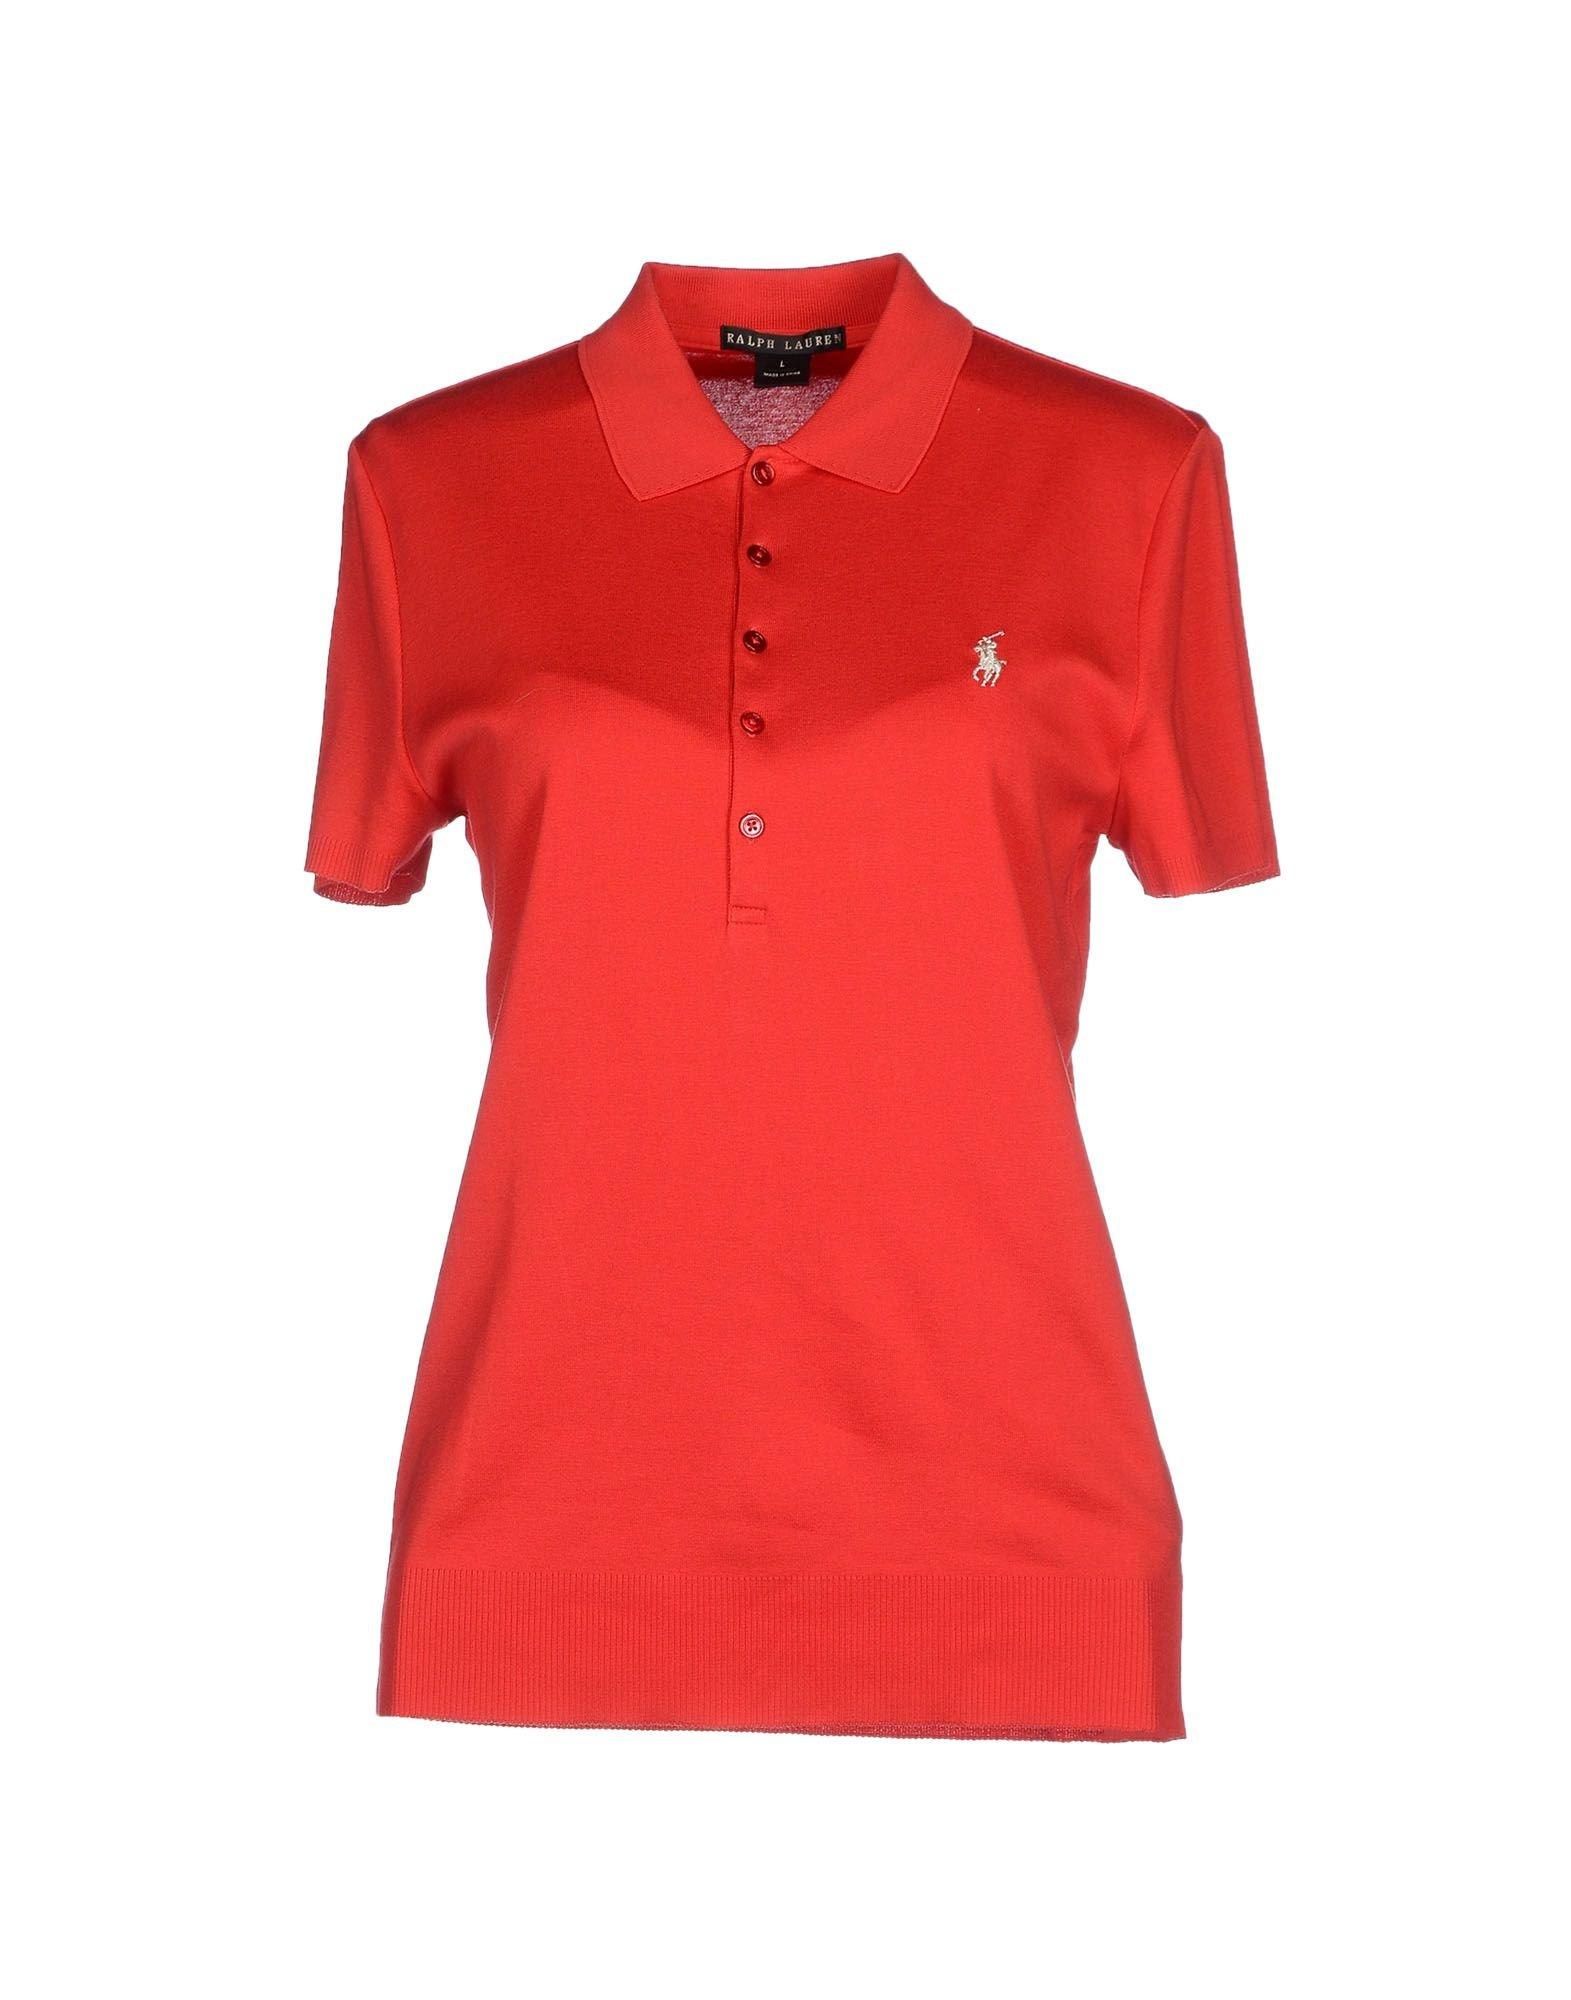 Ralph lauren black label polo shirt in red lyst for Ralph lauren black label polo shirt